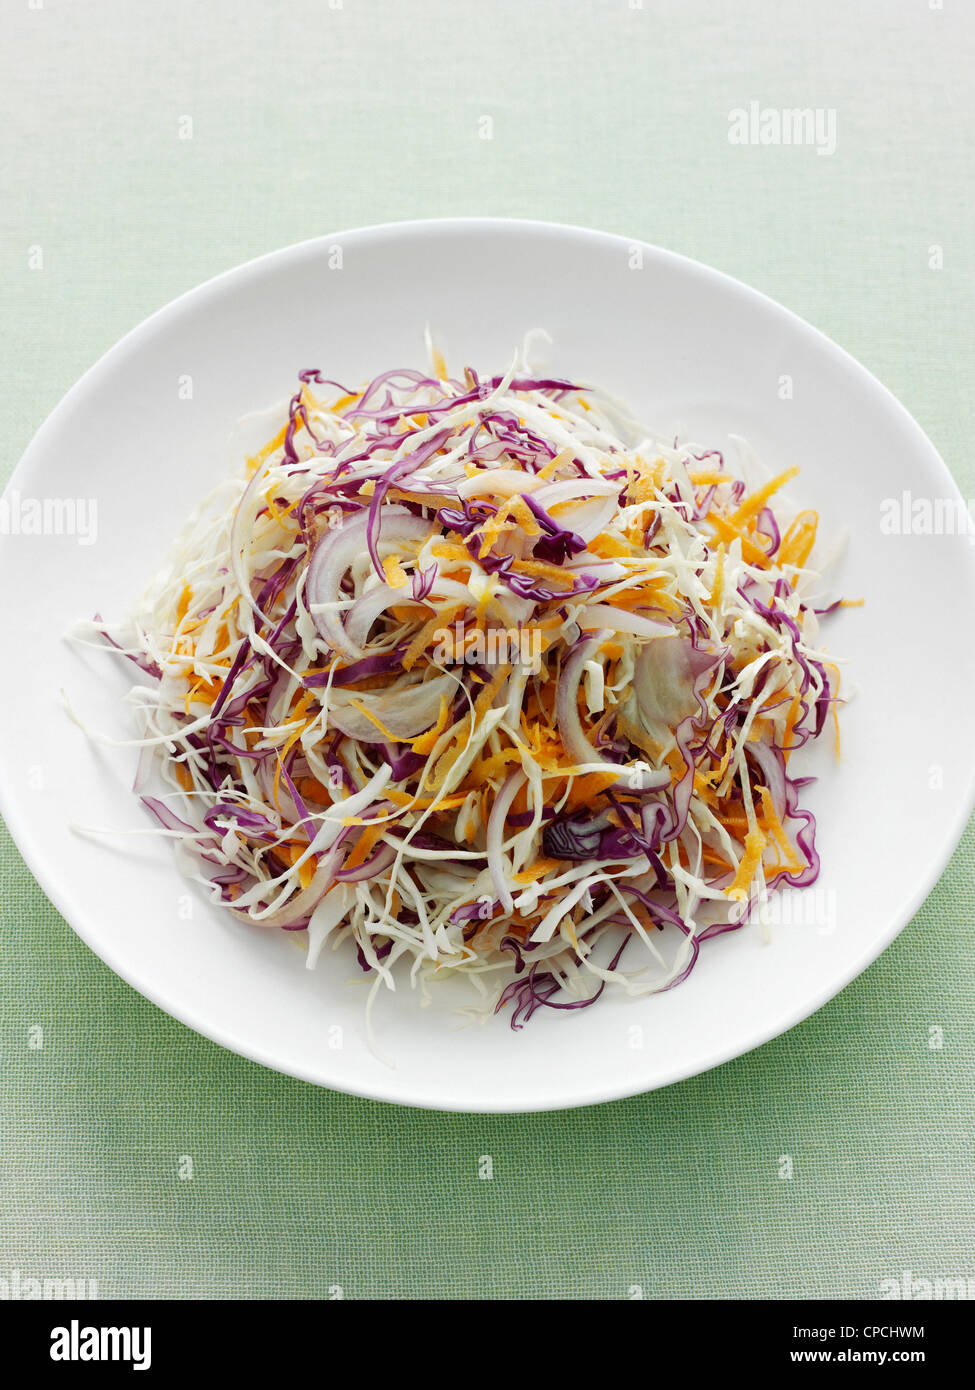 Teller mit geriebenen Kohl und Karotten Stockbild